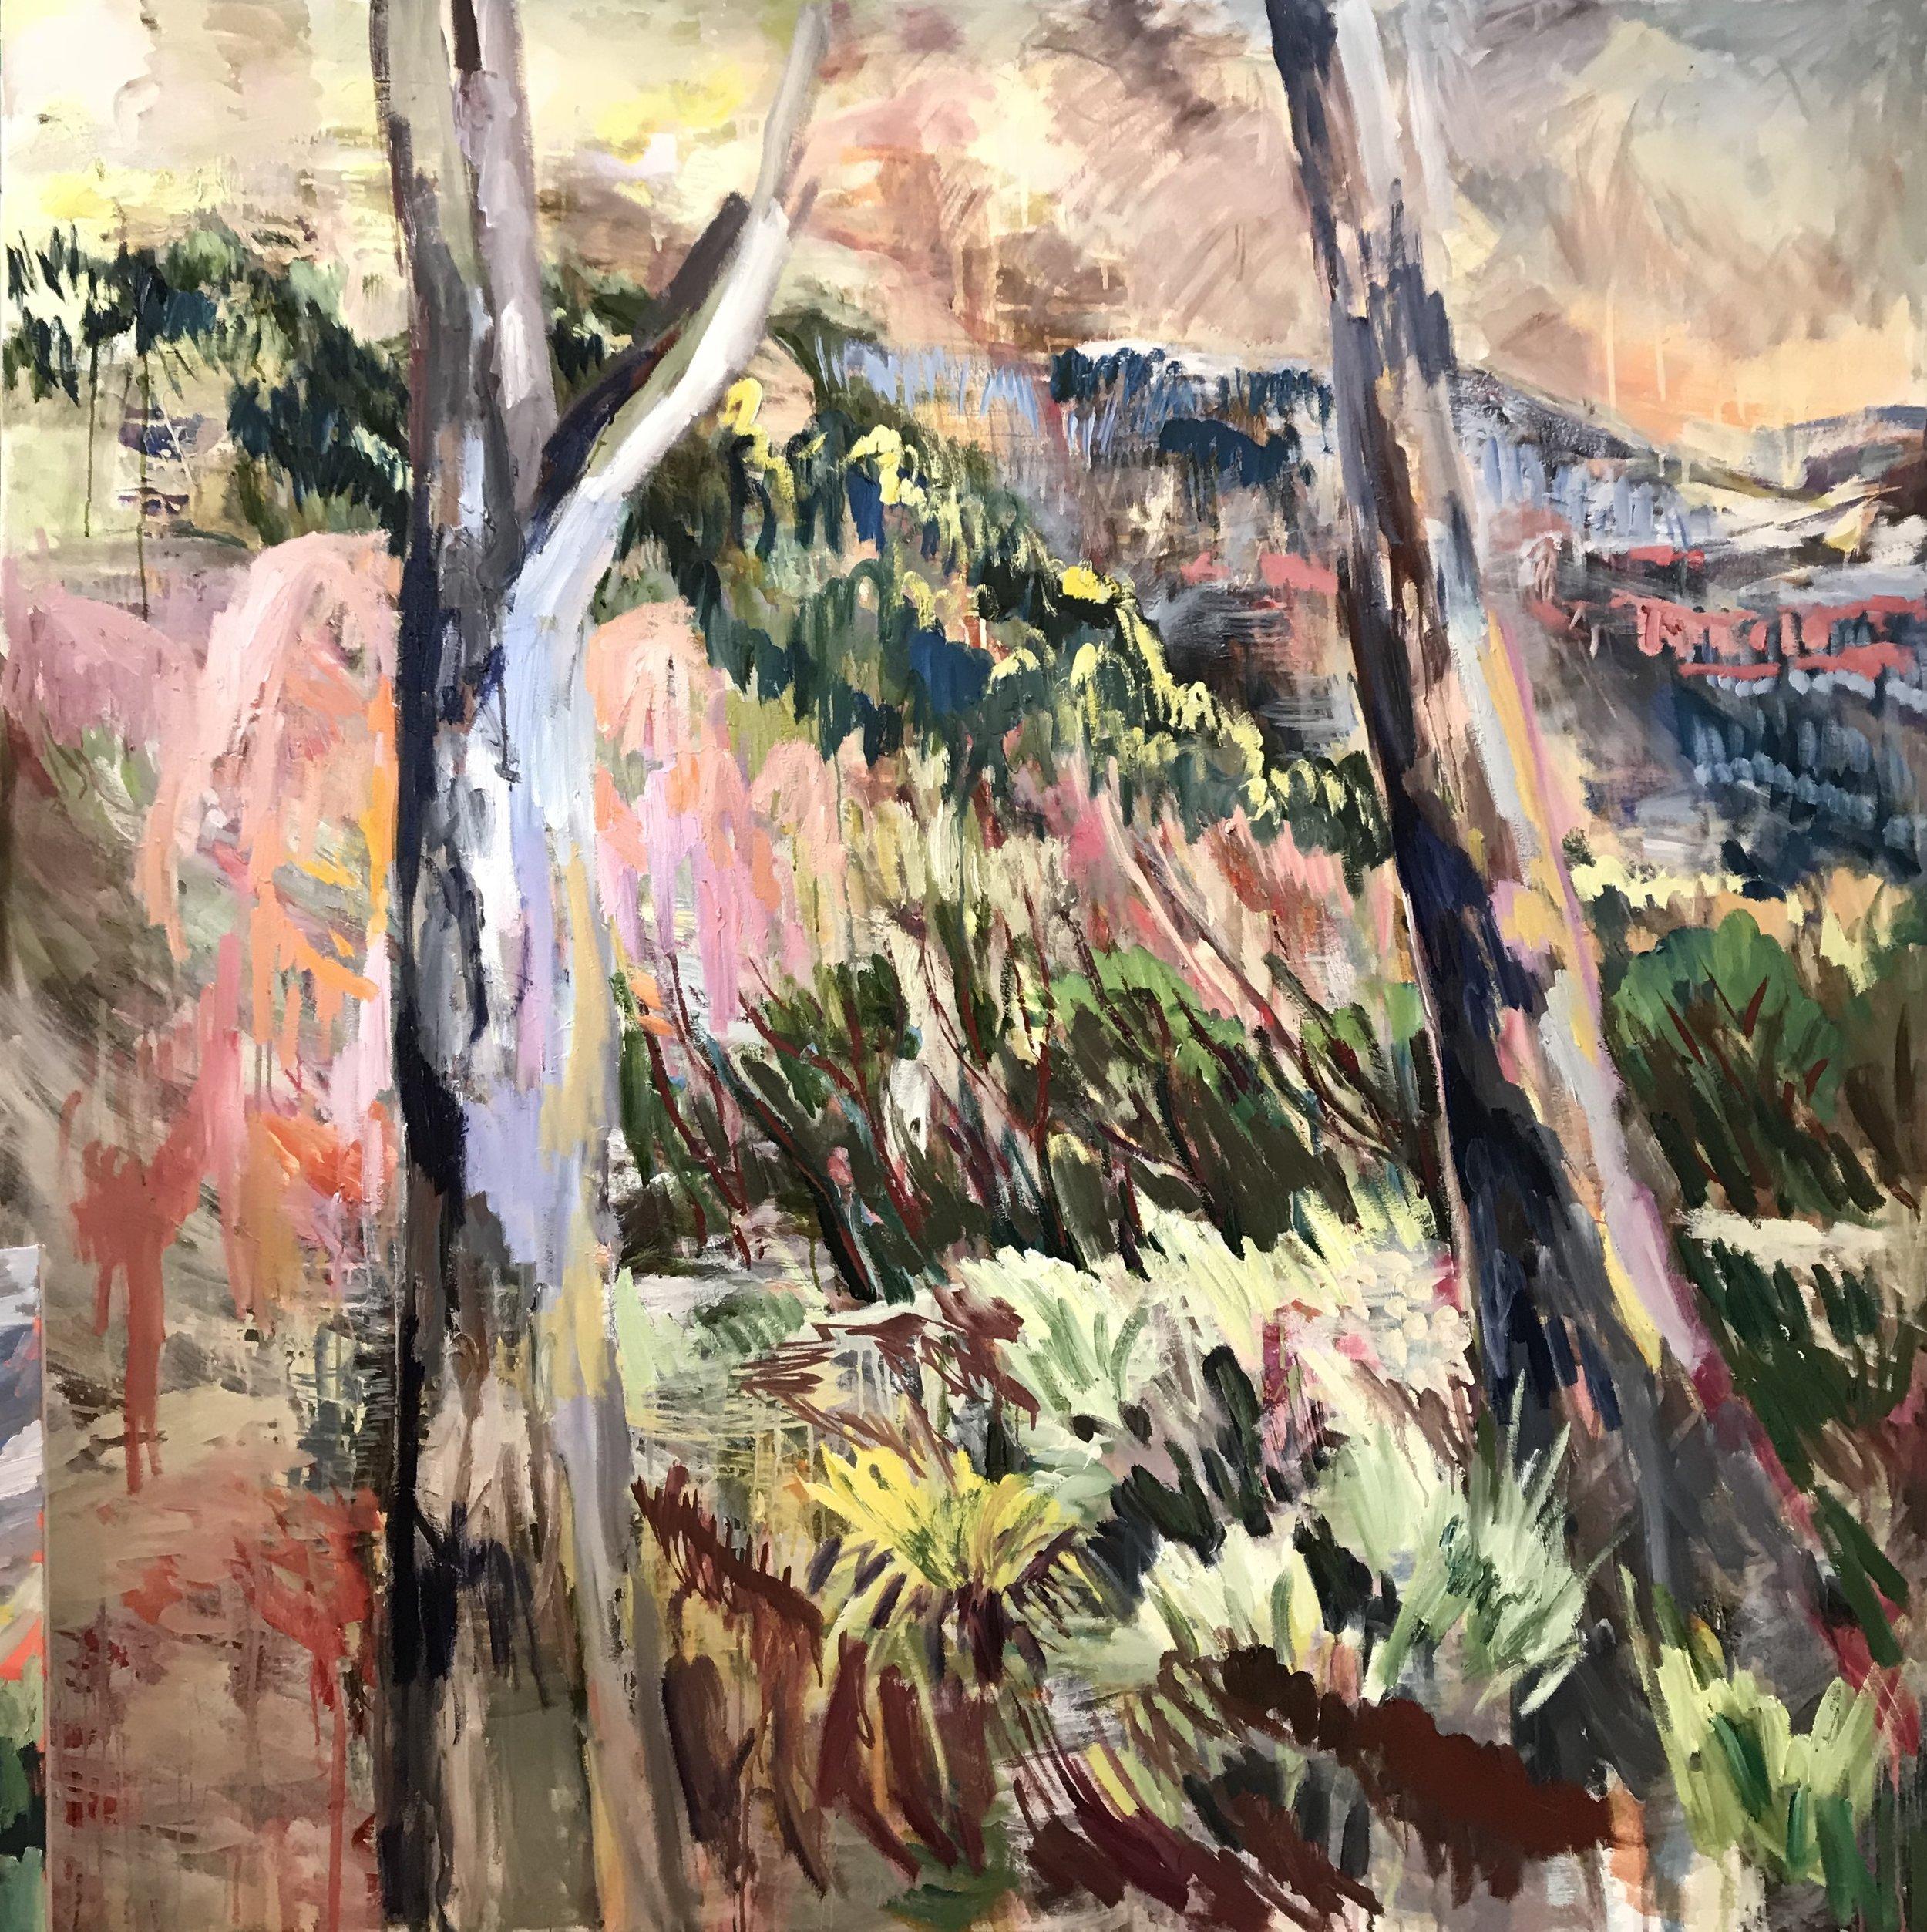 Katoomba Dreaming by Rachel Hannan